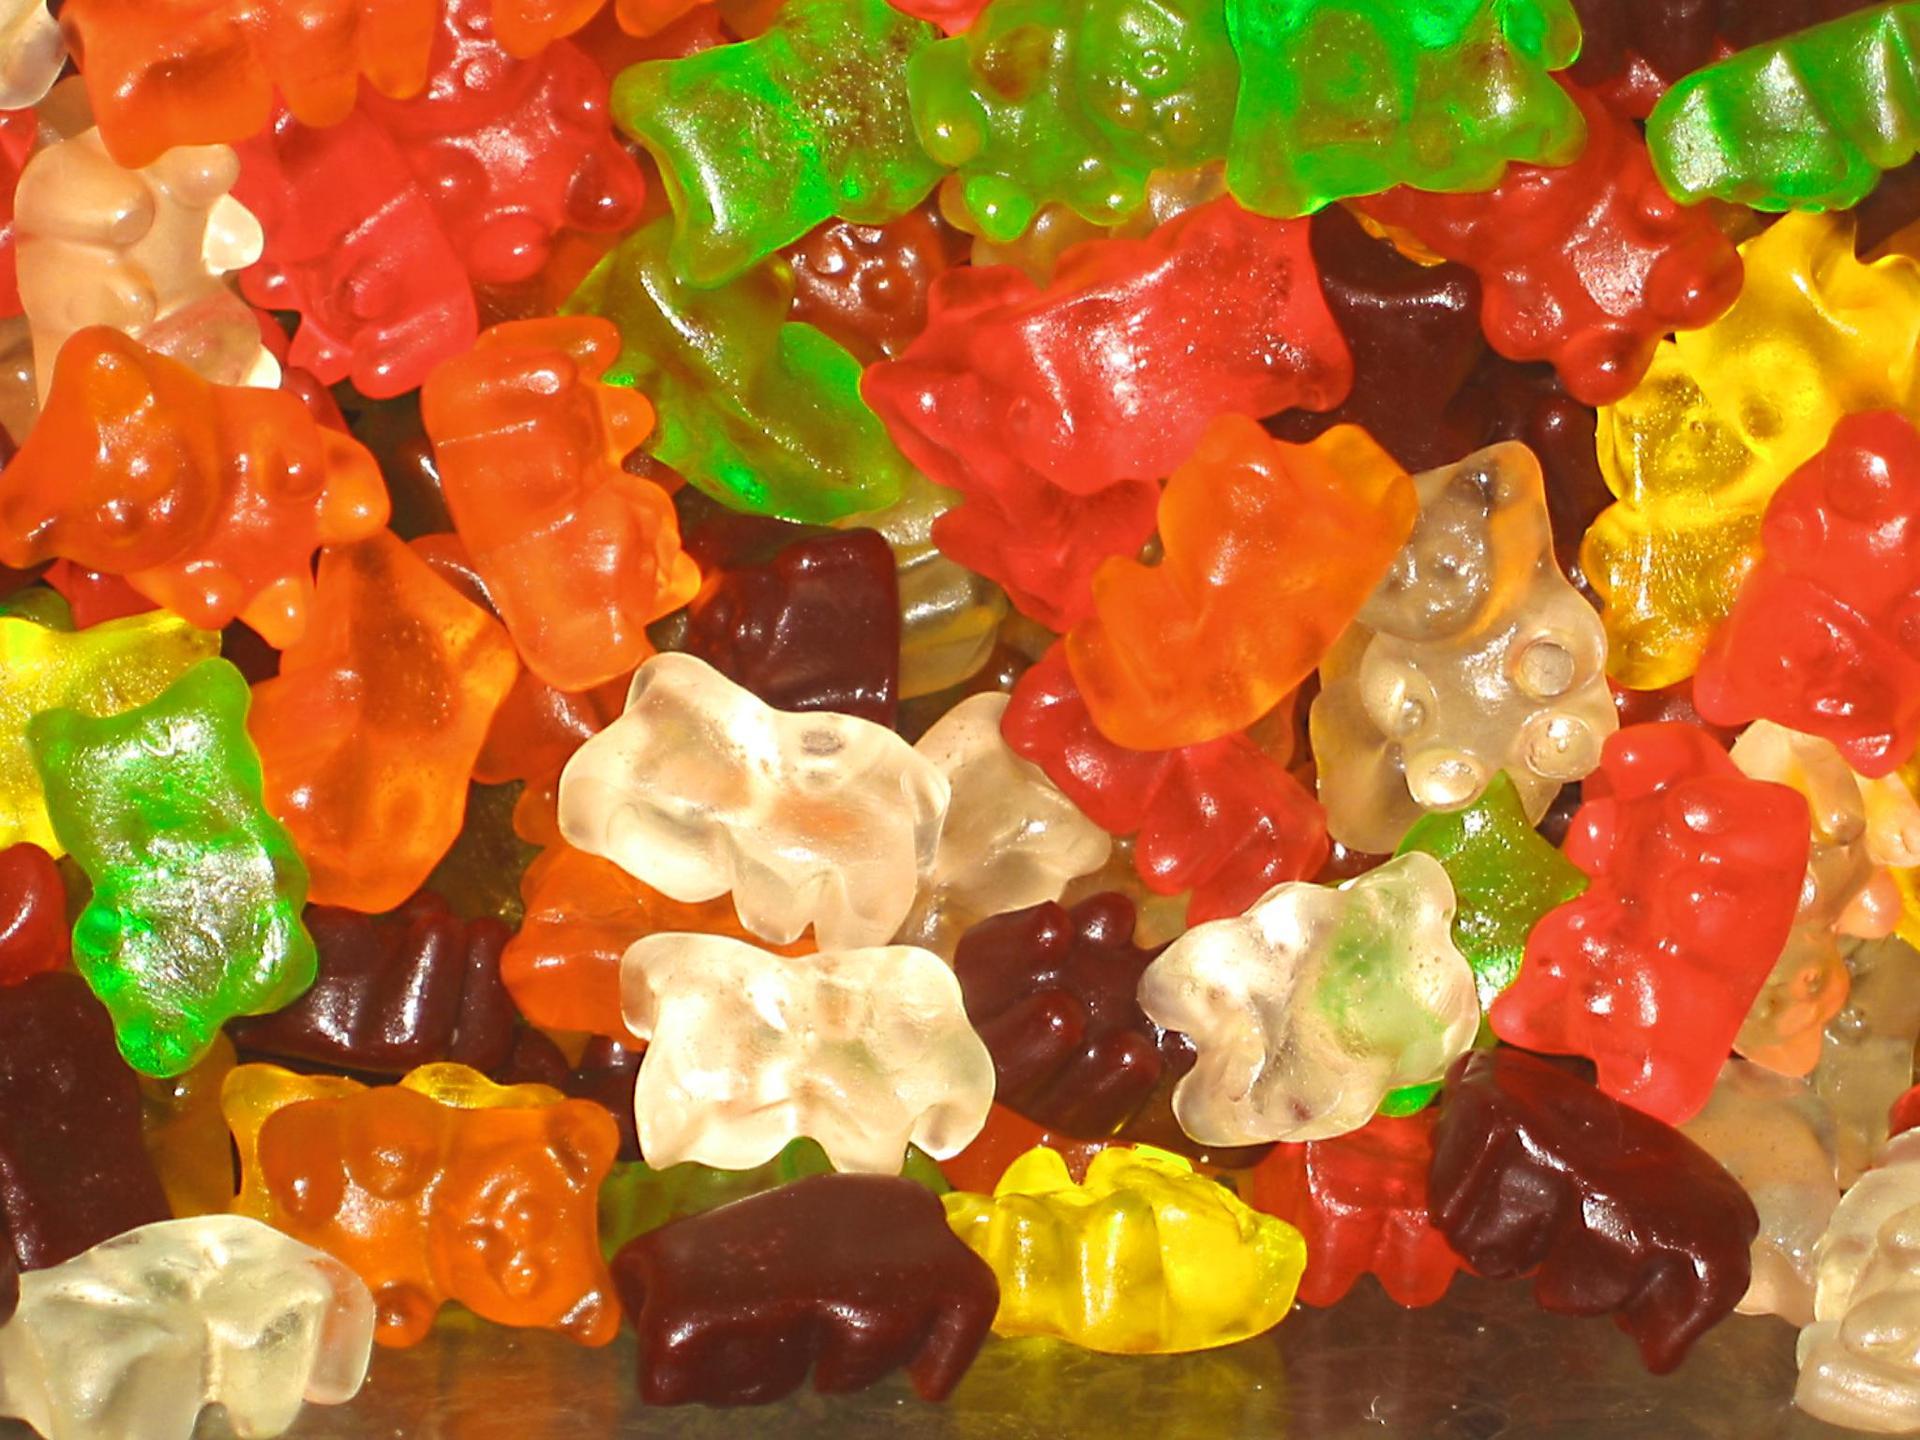 Gummy Bear Wallpaper 2810